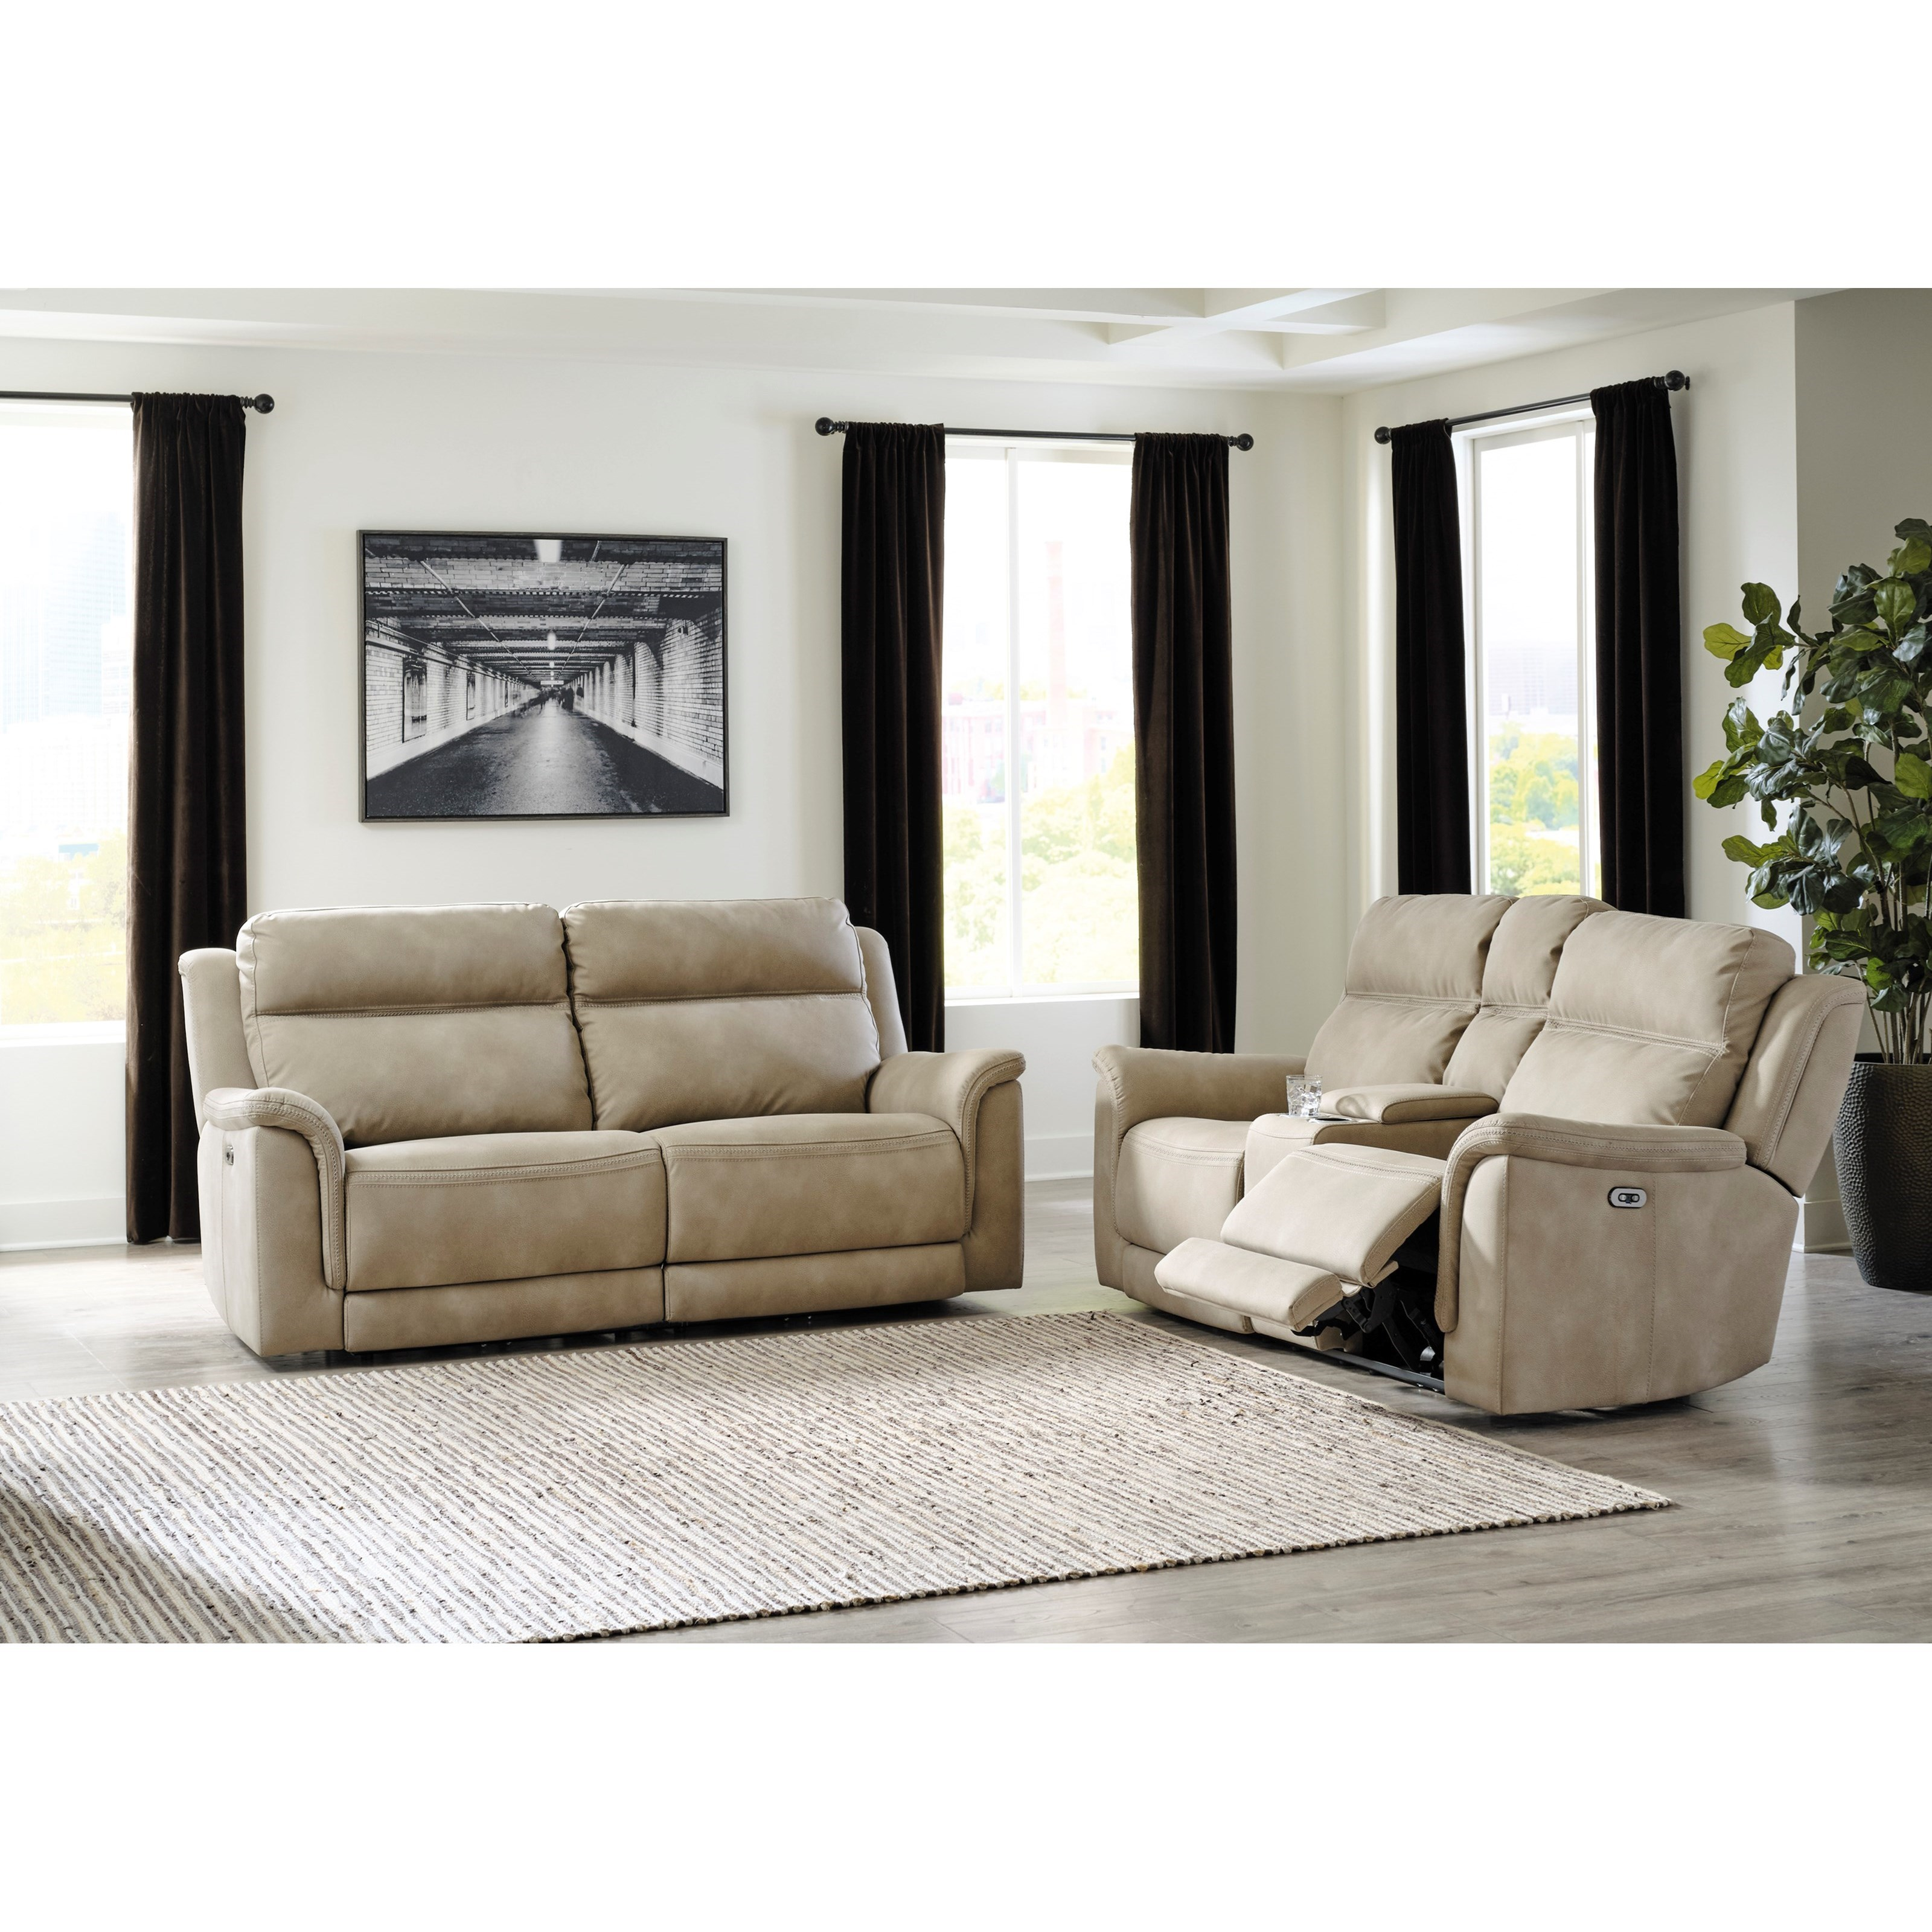 ashley furniture signature design nextgen durapella 59302